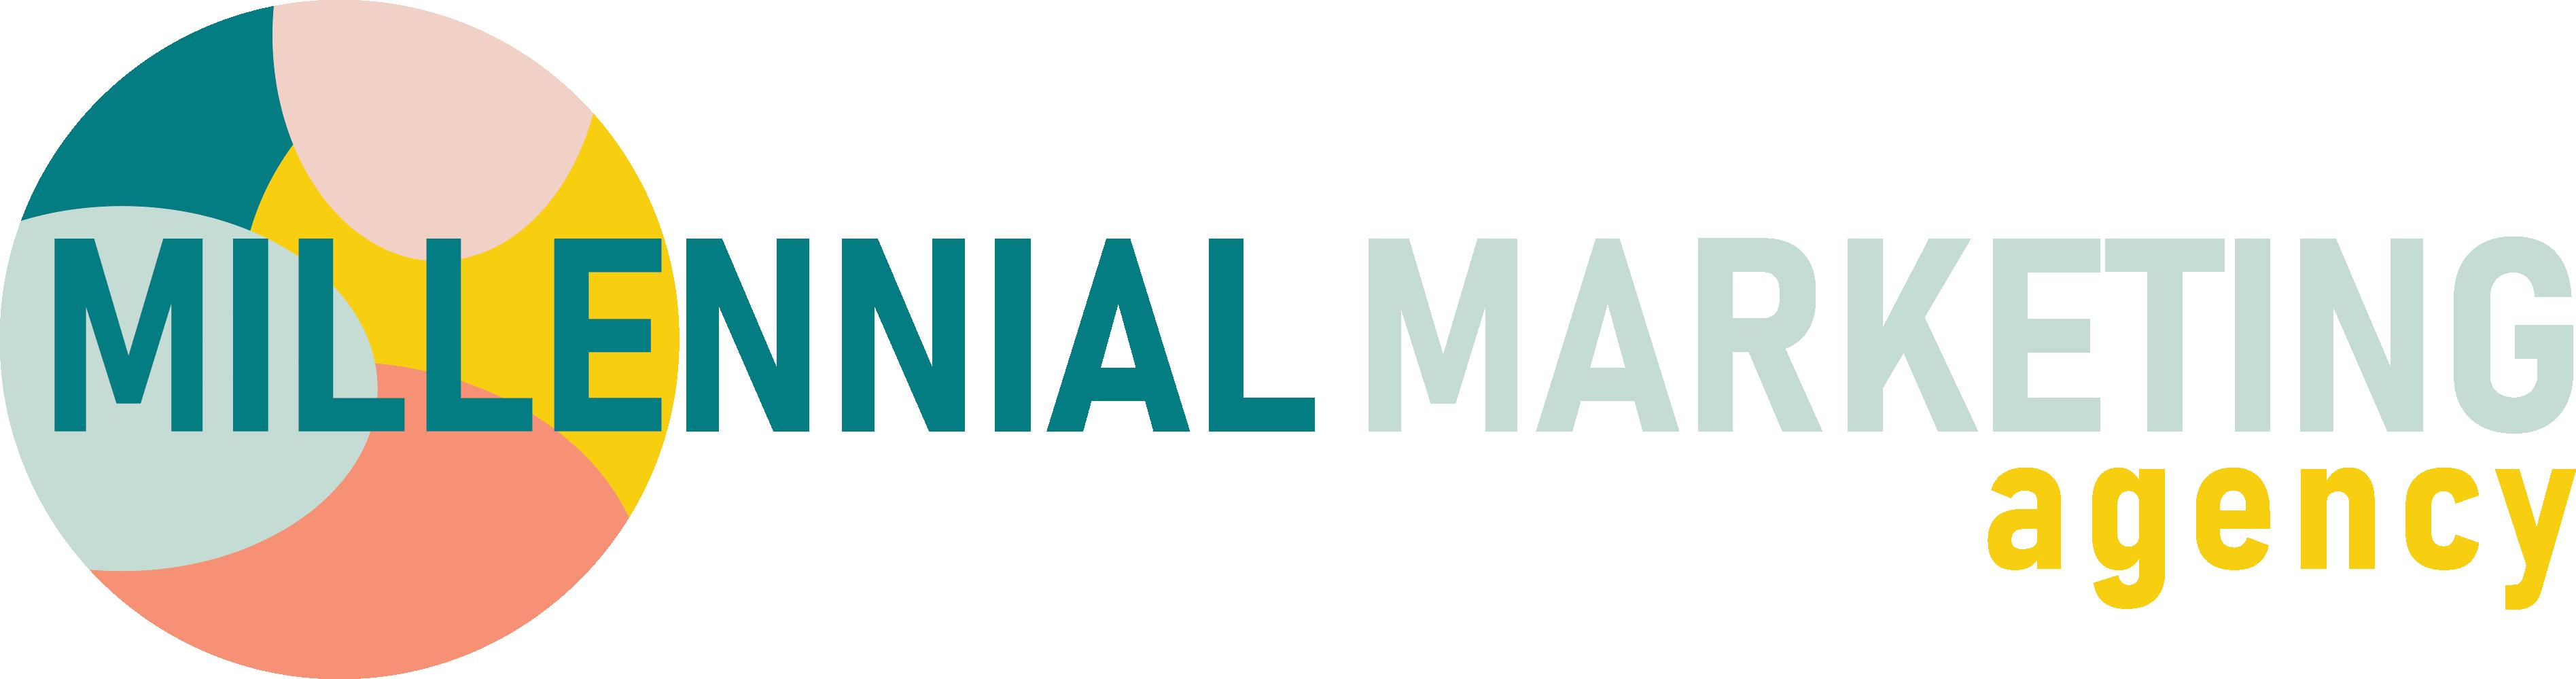 Millennial Marketing Agency